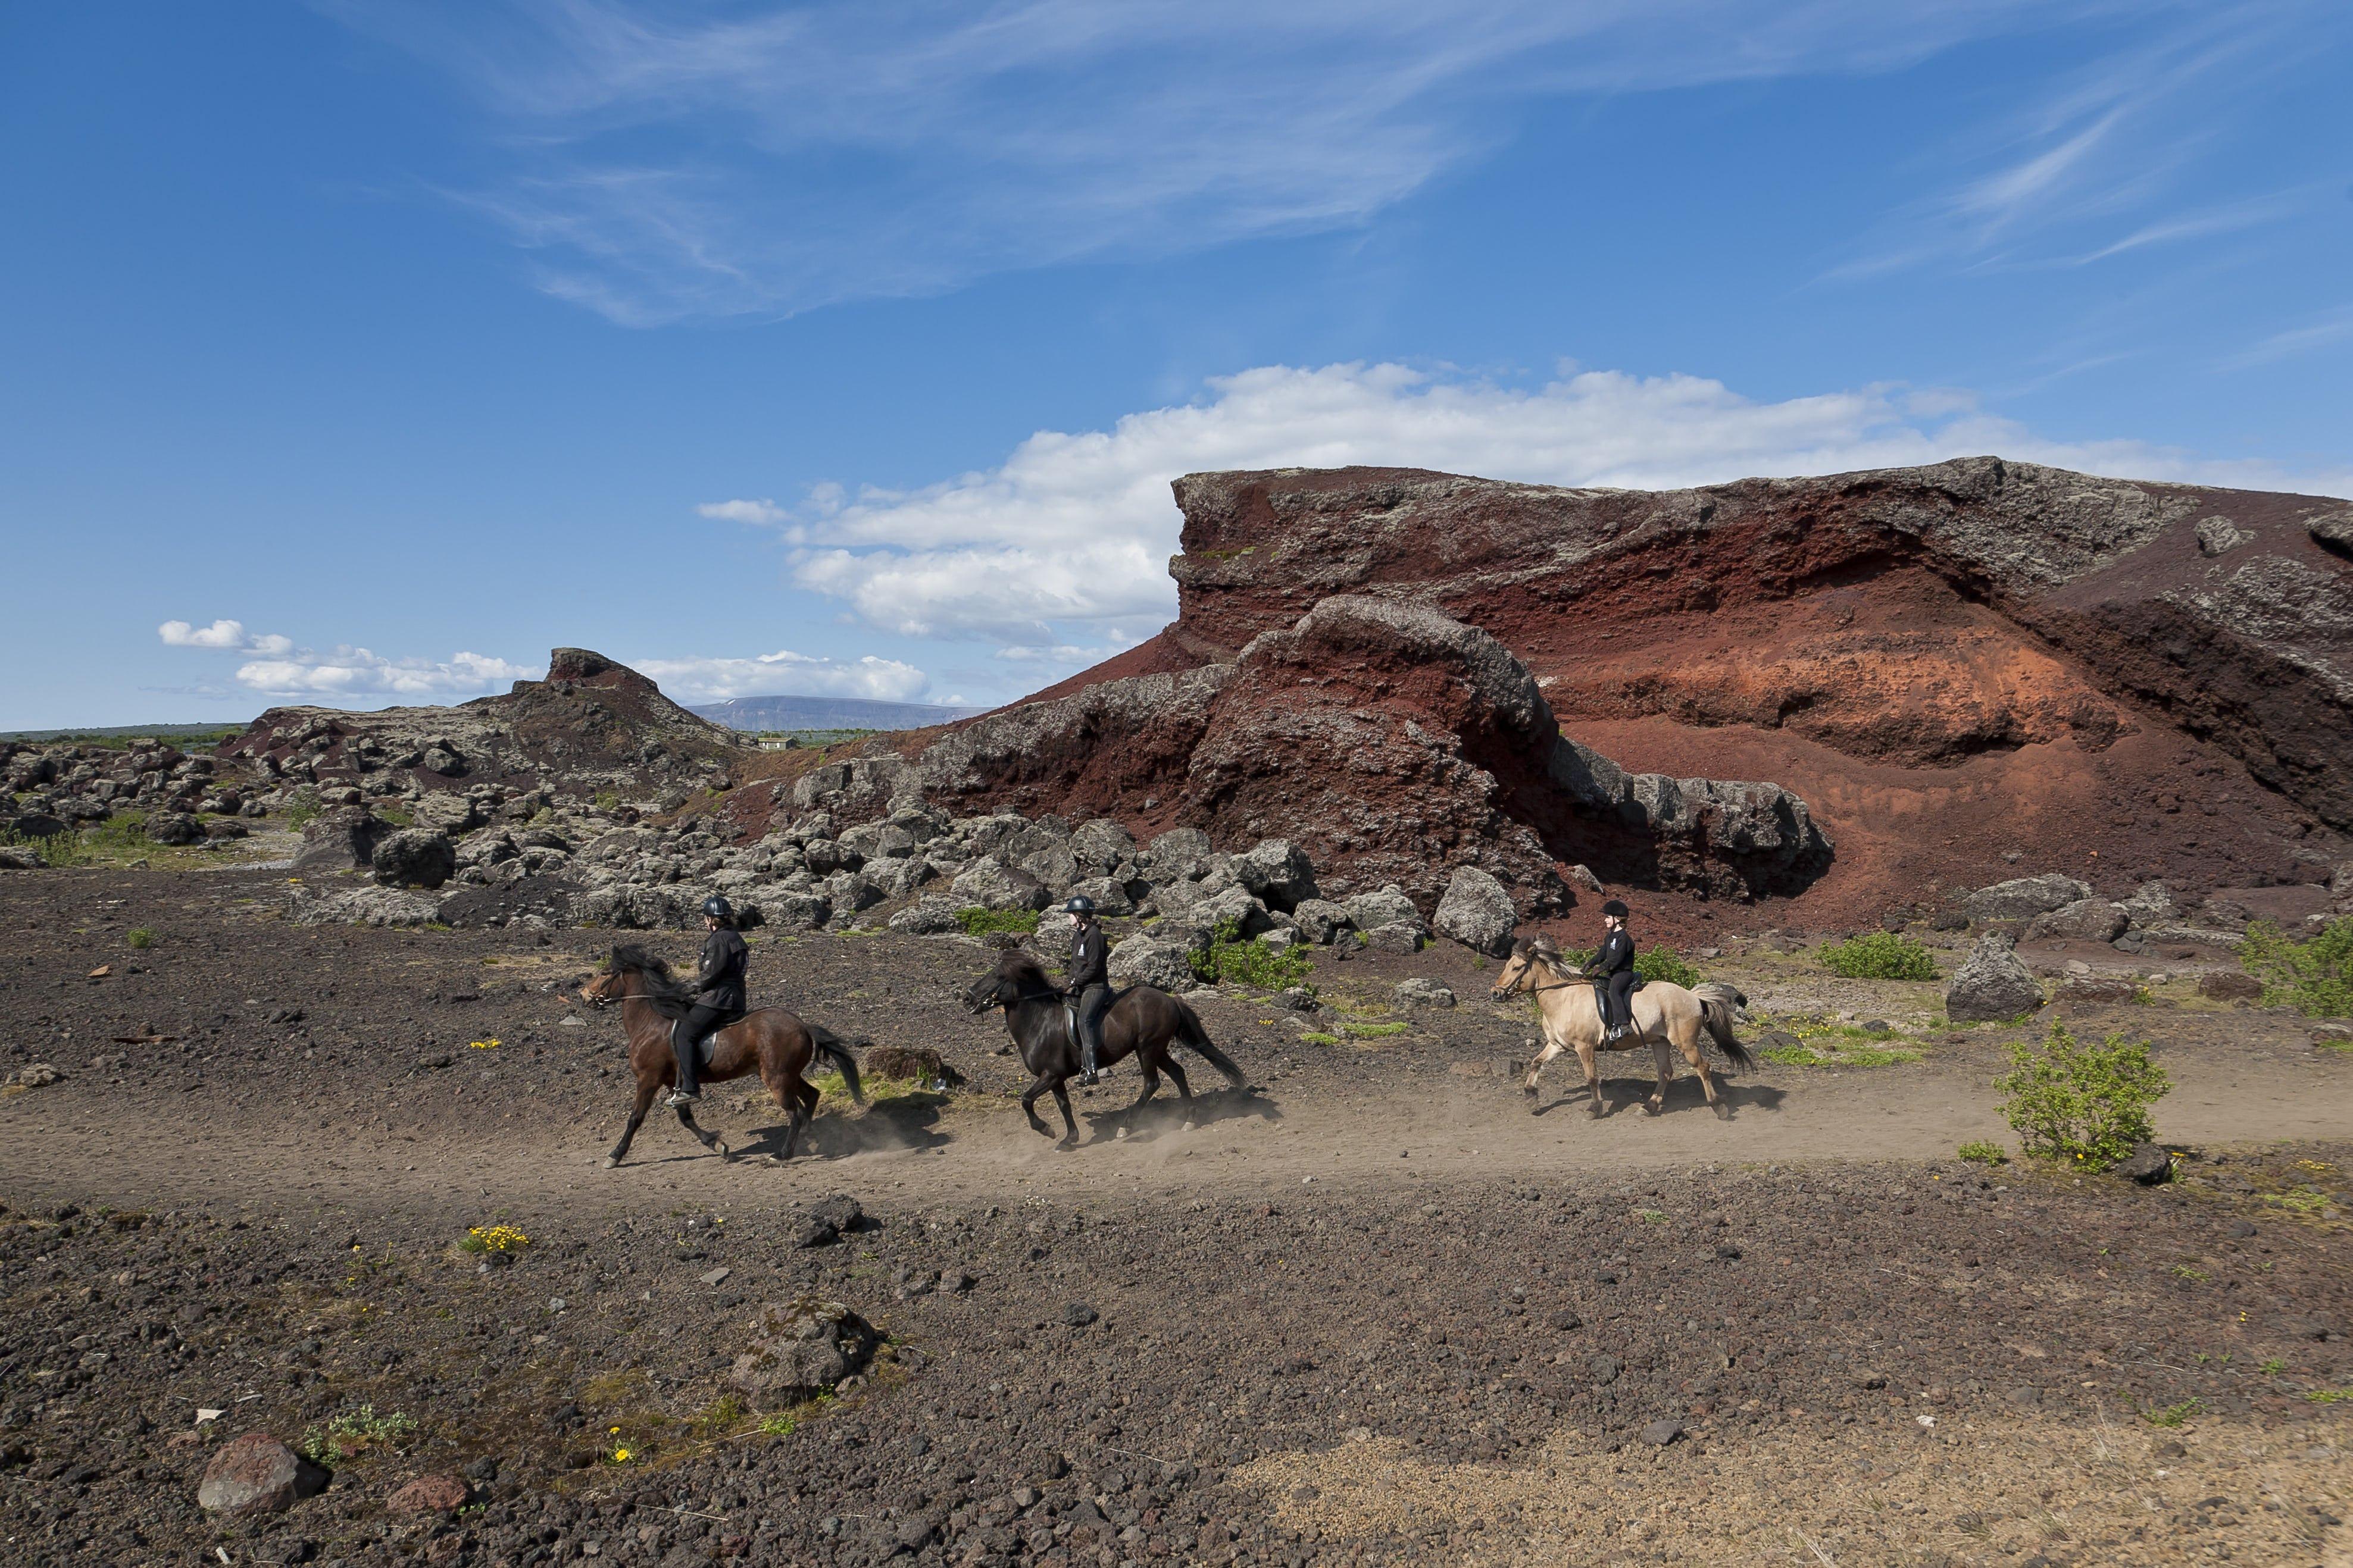 Icelandic horse riding through the crimson-coloured Rauðhólar outside Reykjavík.